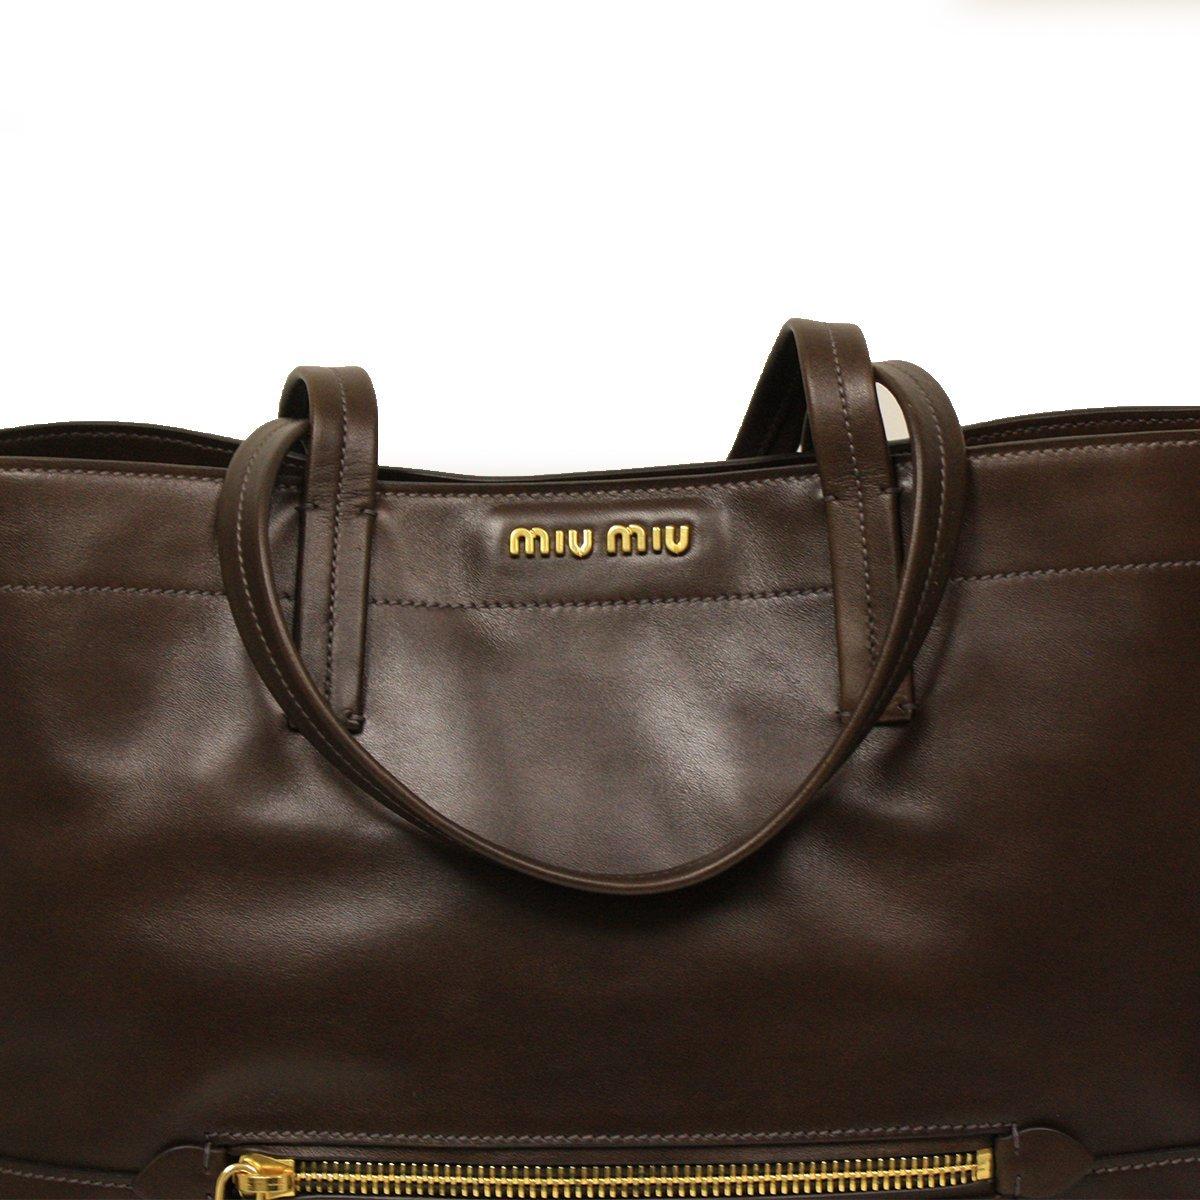 44cf2d0086b3 Amazon.com  Miu Miu RR1820 Vitello Soft Brown Leather Shopping Tote Bag   Shoes